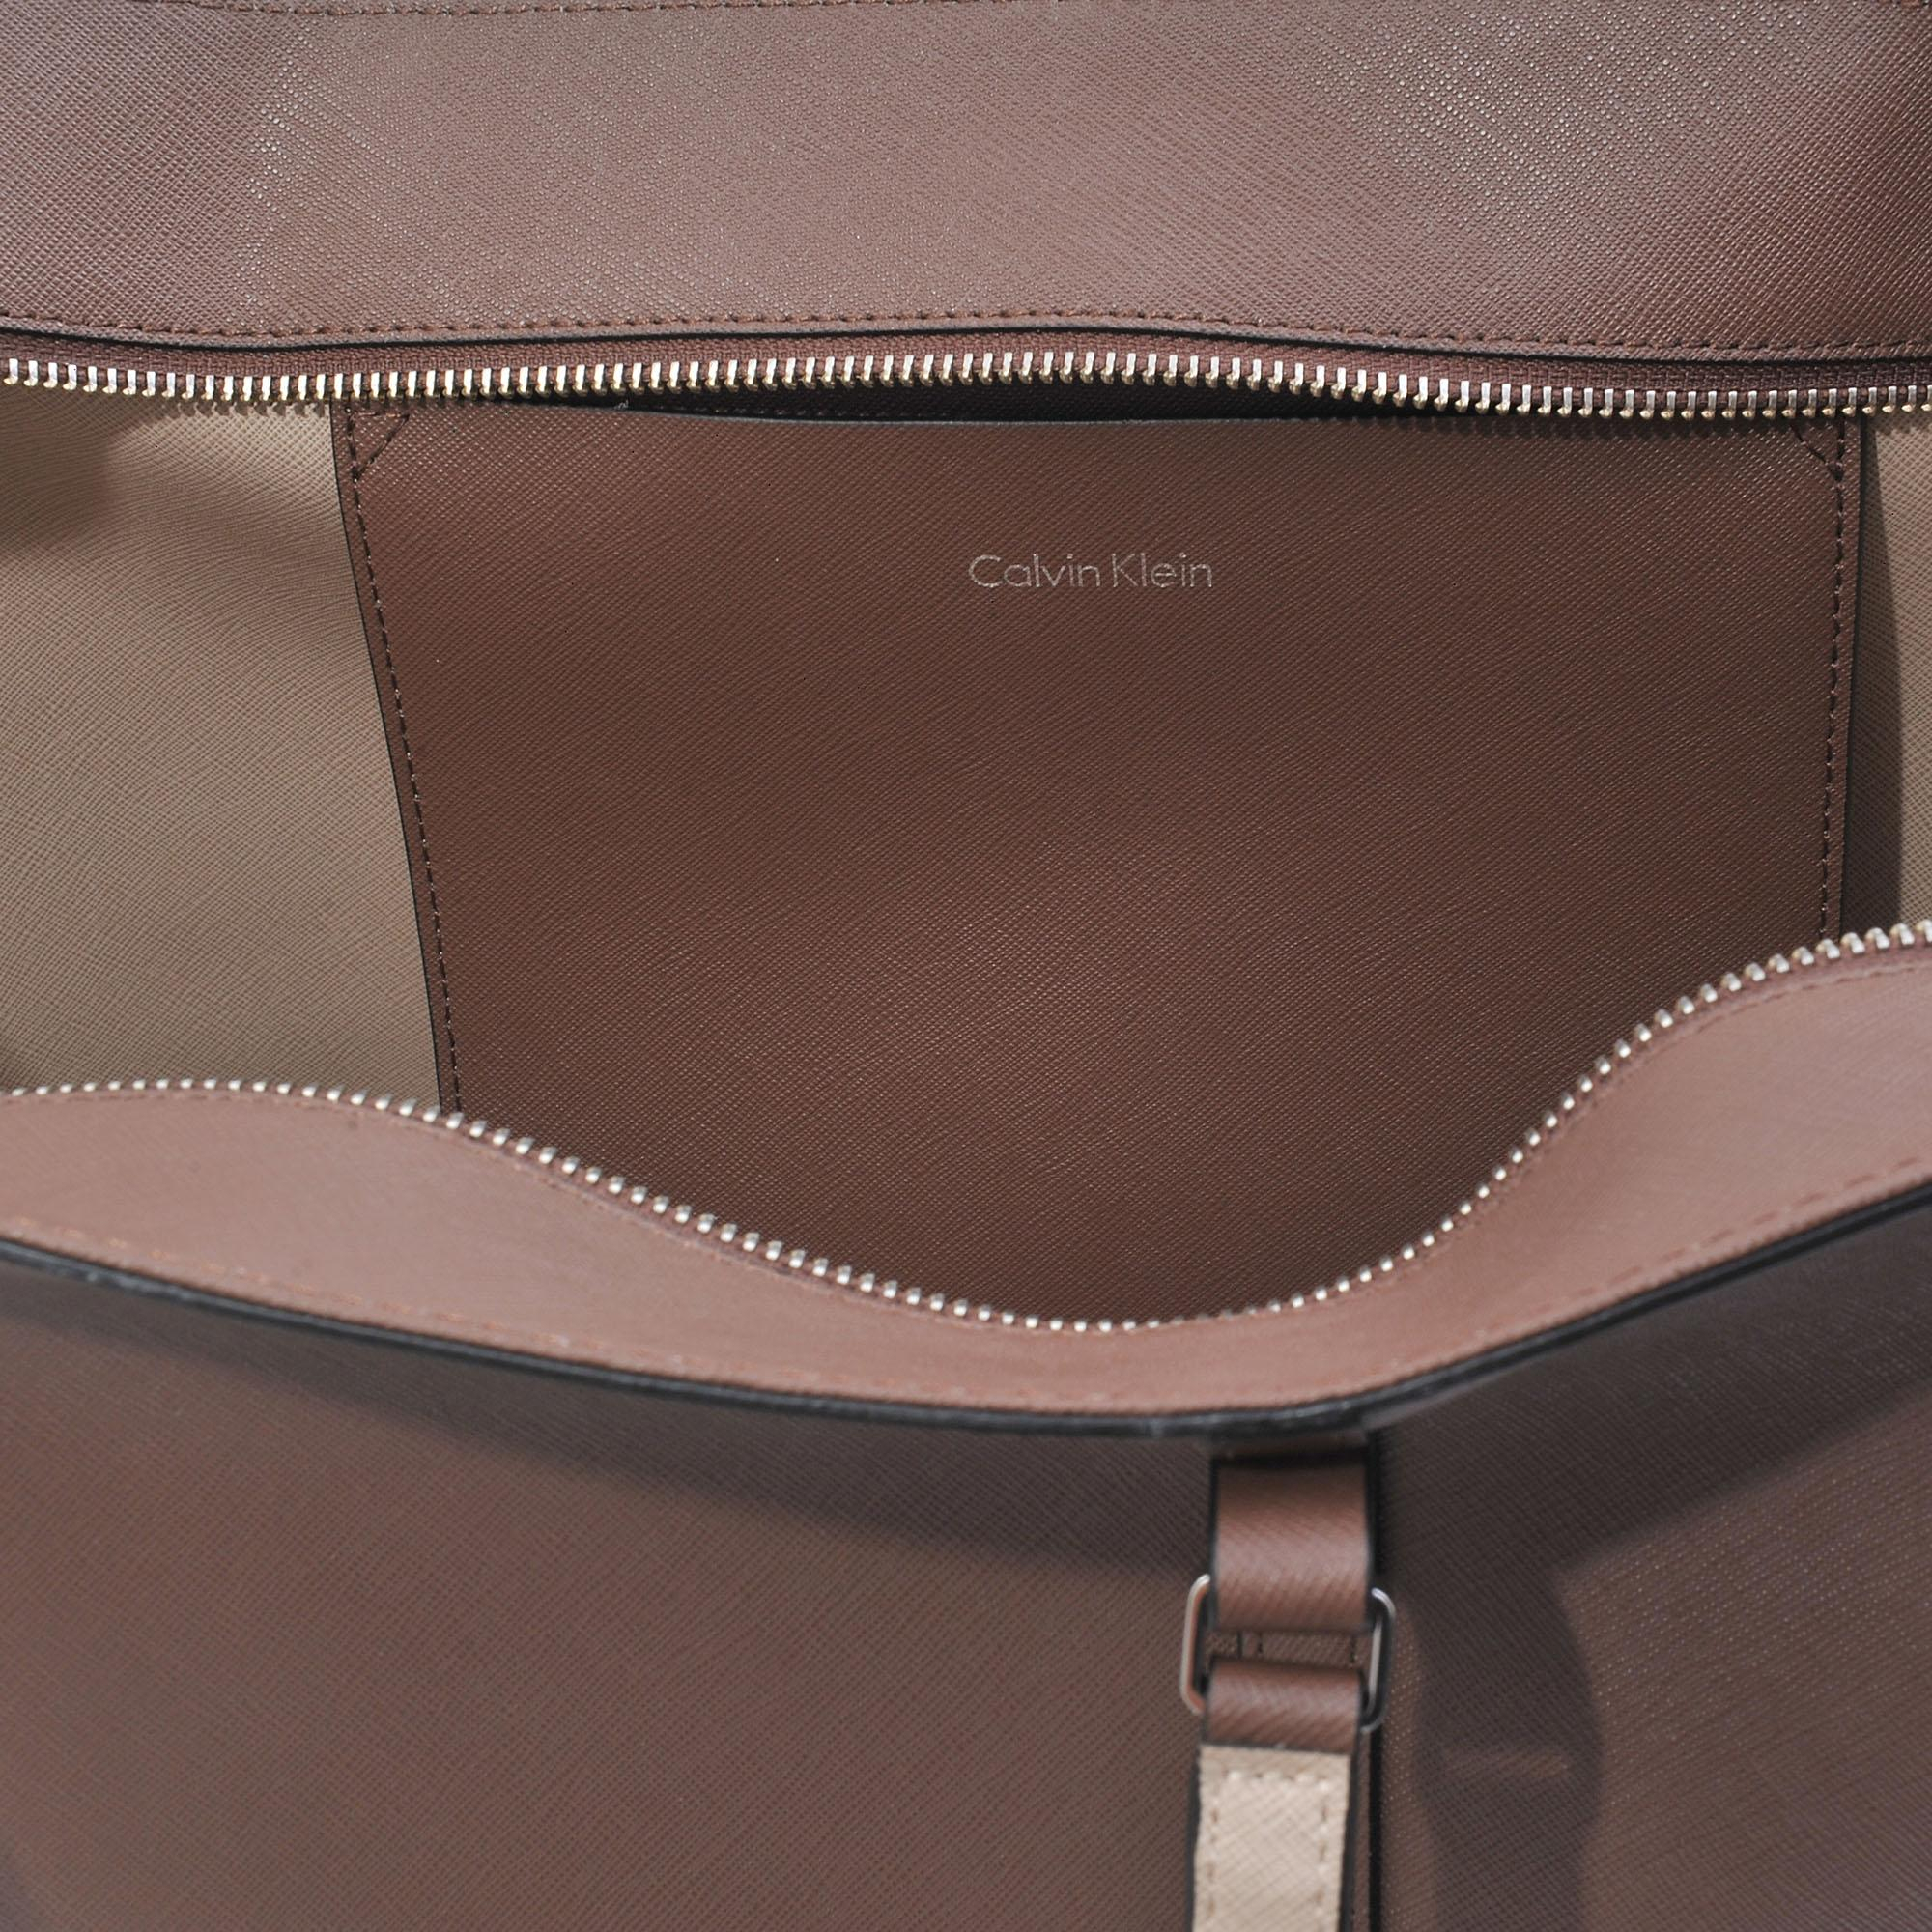 663588de73 Calvin Klein East West Sophie Saffiano Tote in Brown - Lyst